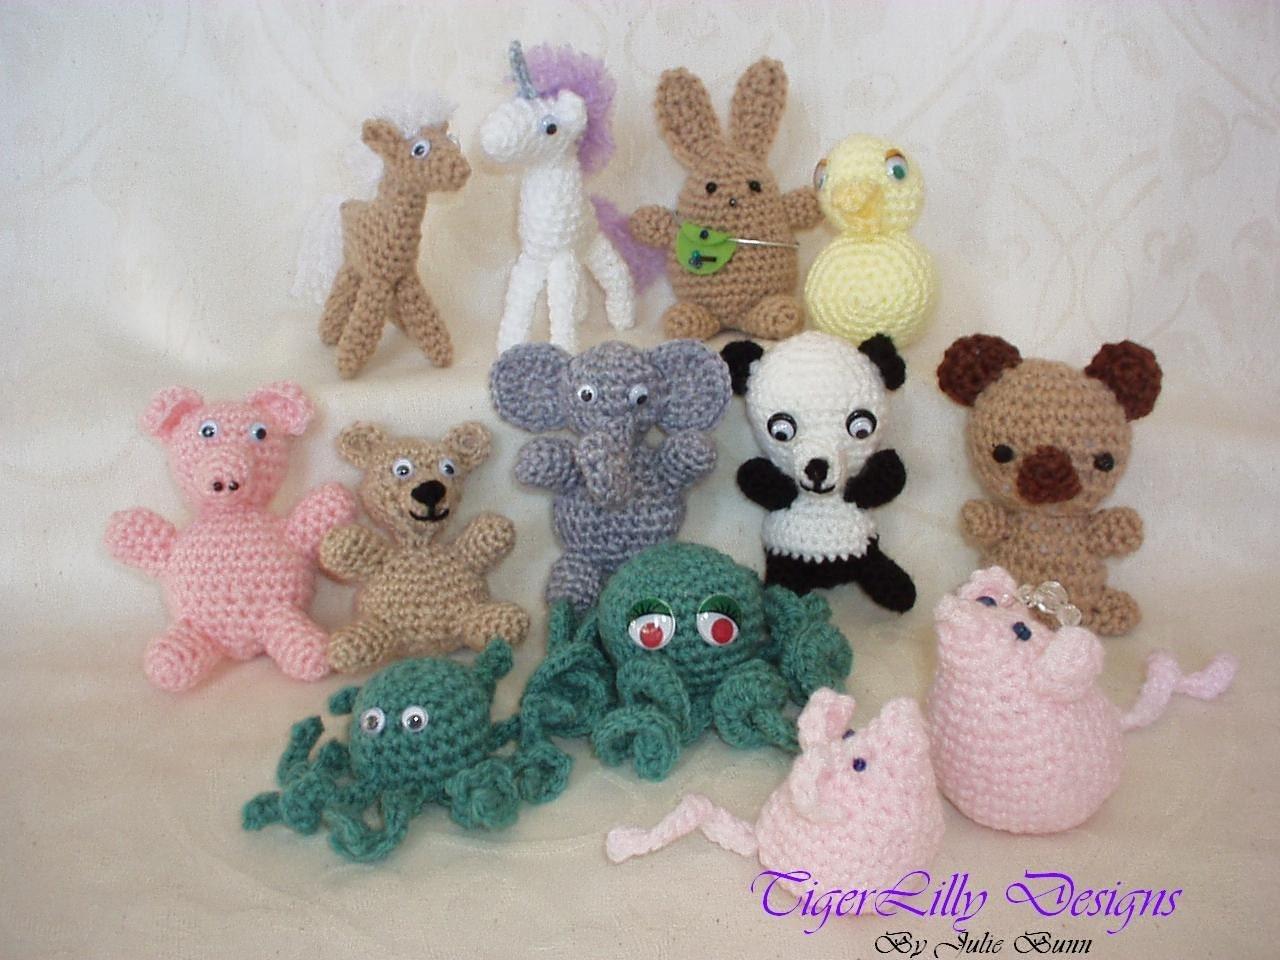 Free Safari Animal Amigurumi Patterns | Crochet toys free, Crochet ... | 323x430